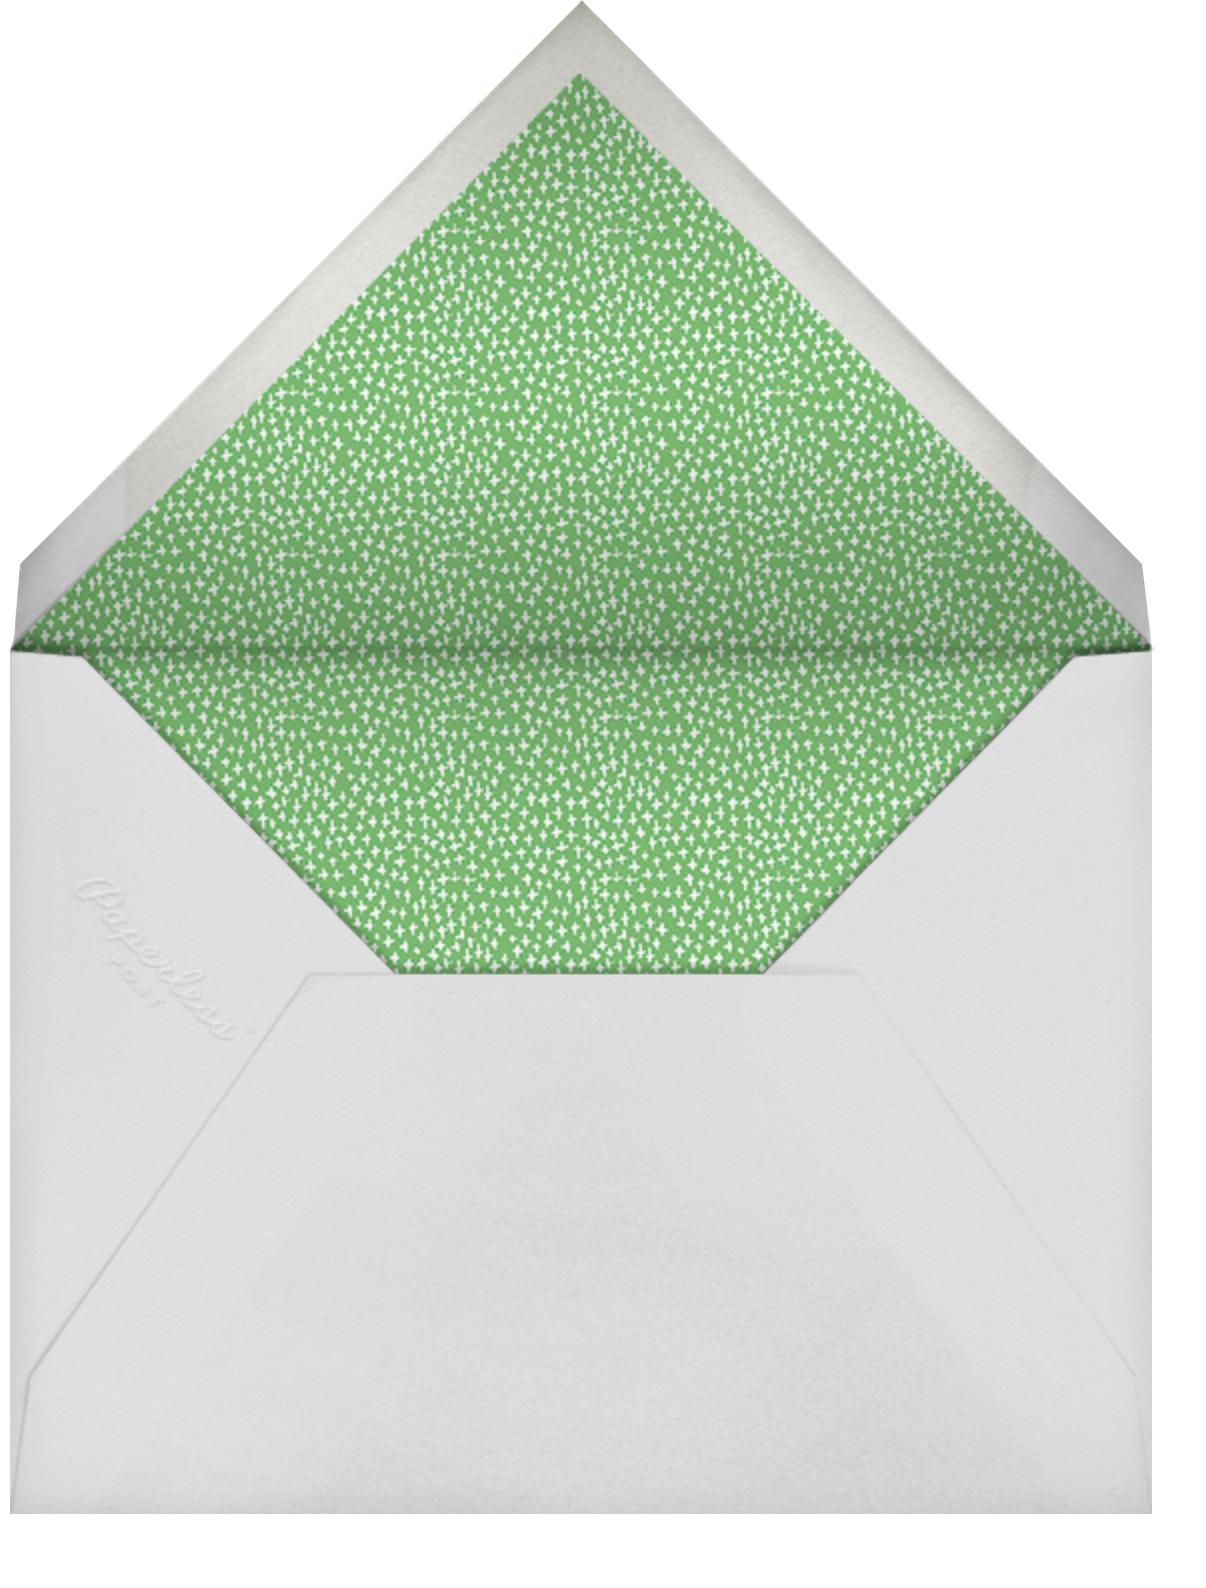 Among the Daisies - Citrus - Mr. Boddington's Studio - Thank you - envelope back